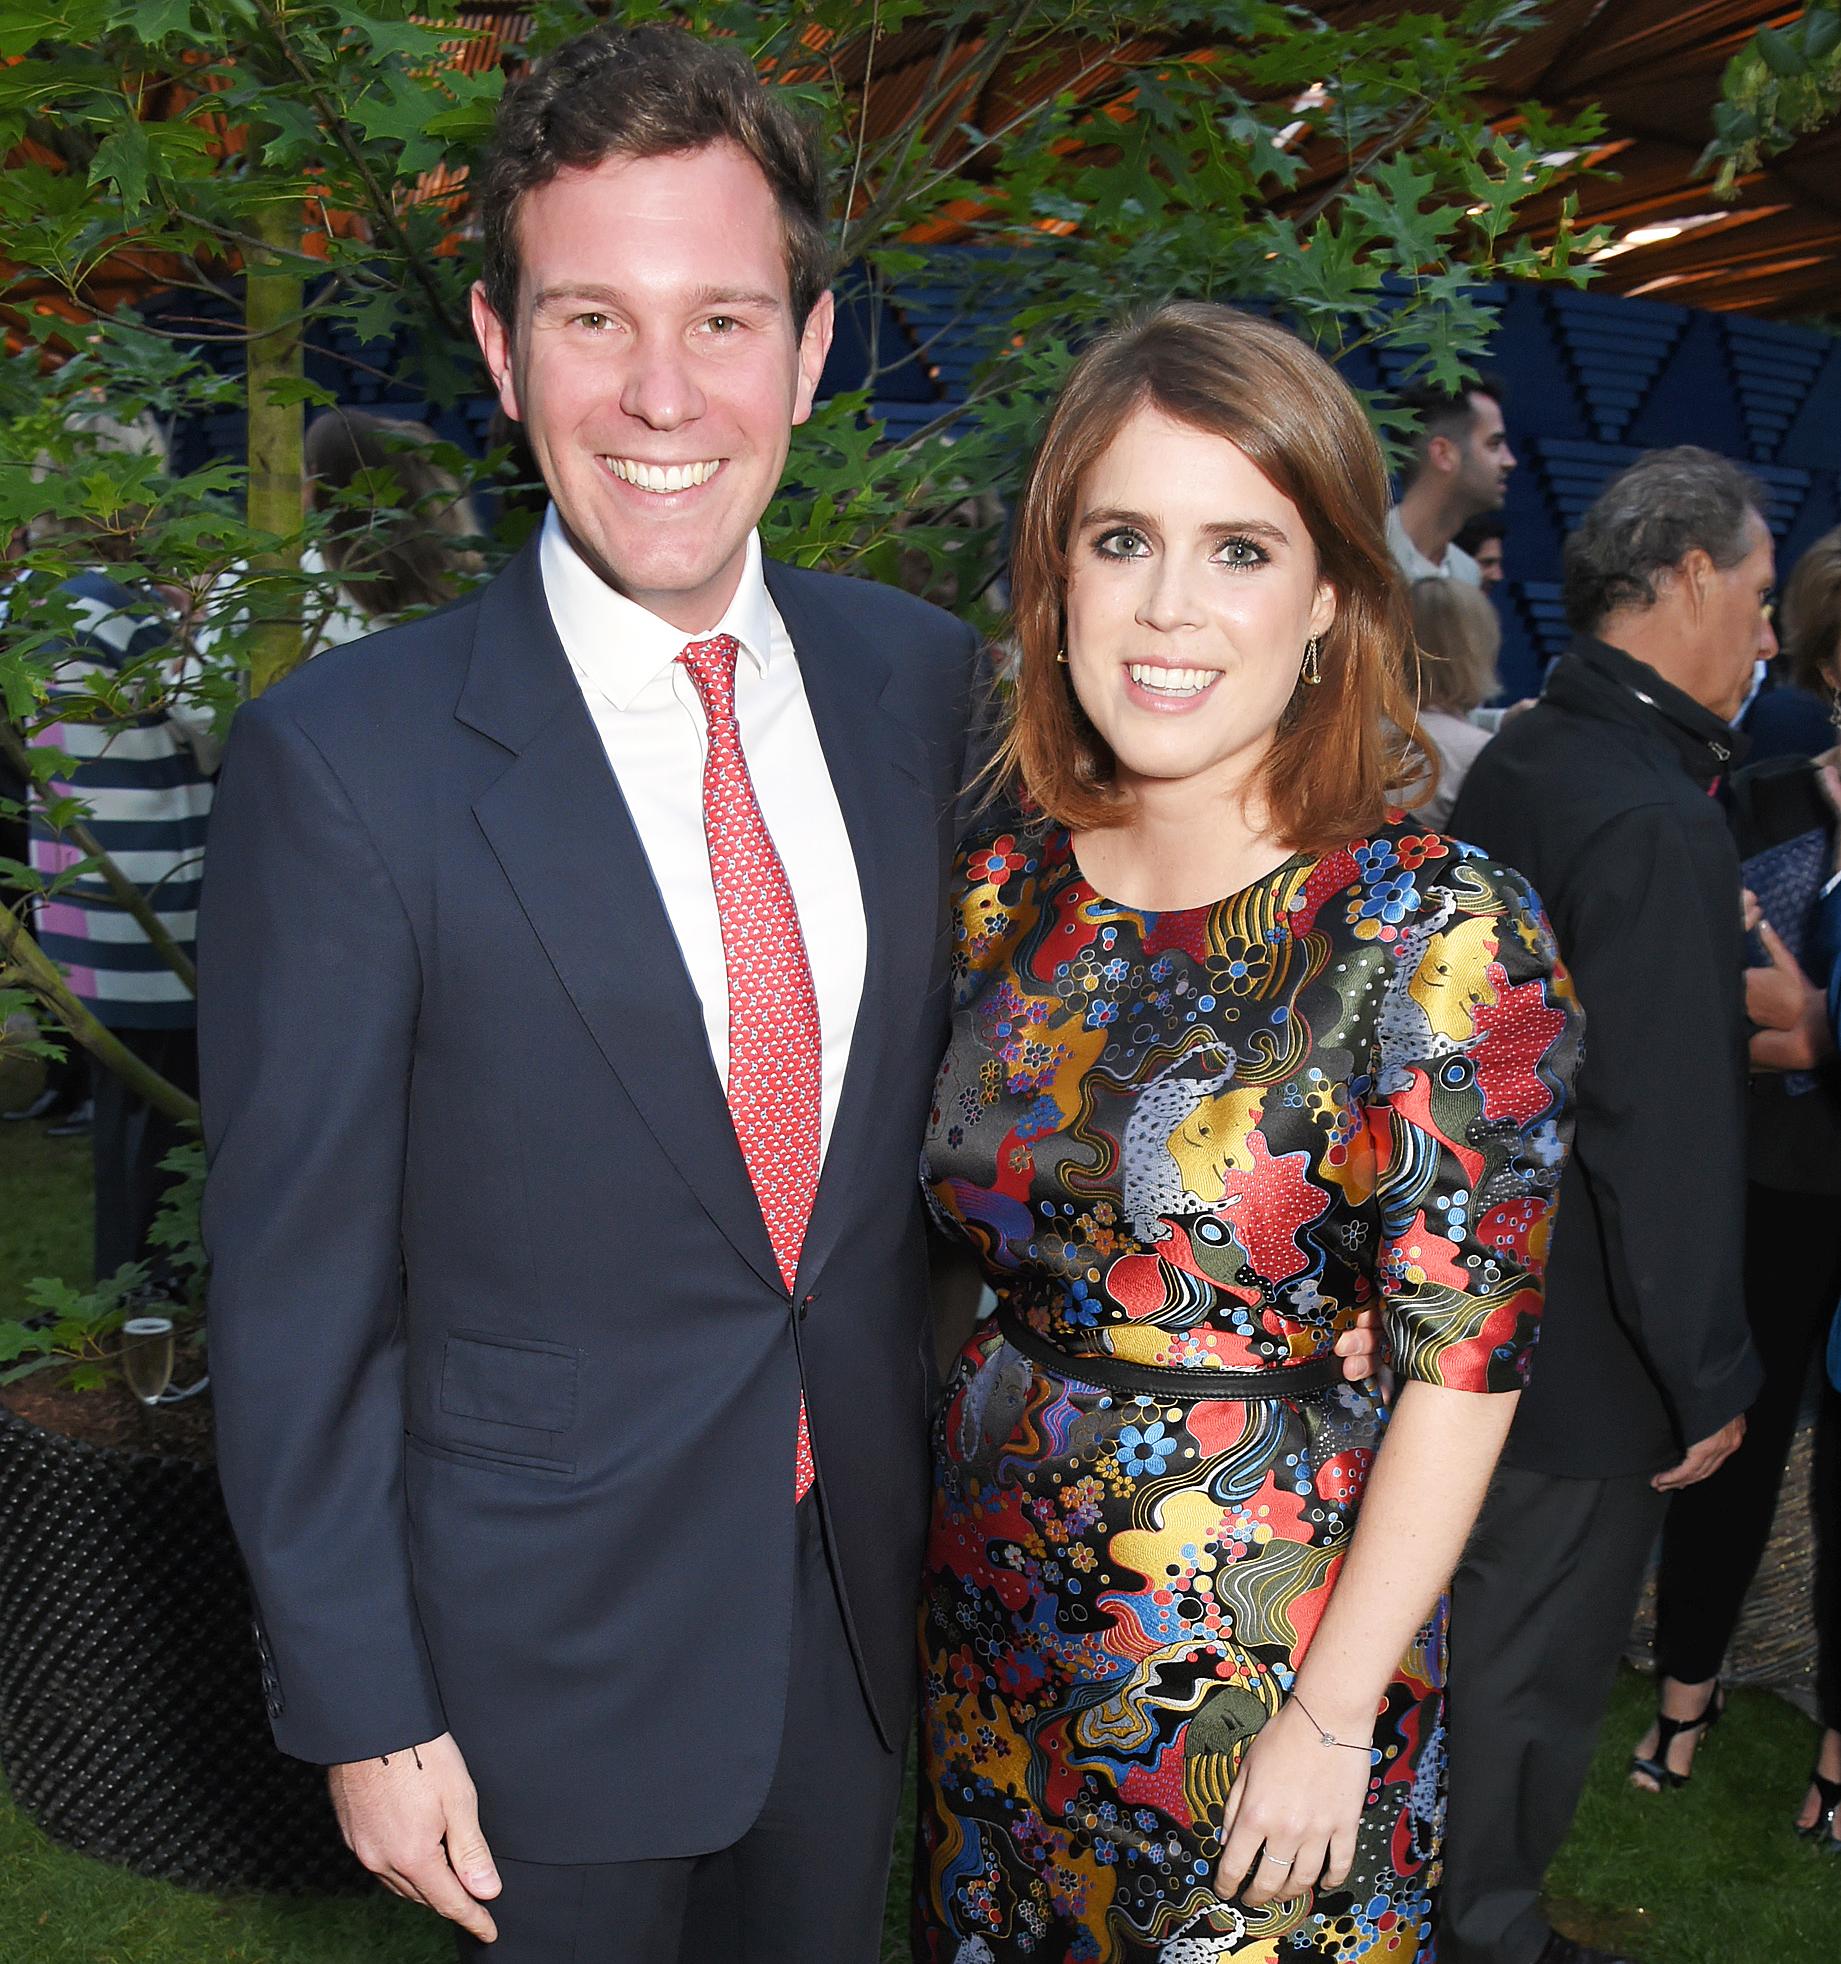 Jack Brooksbank Princess Eugenie Wedding Weight Loss